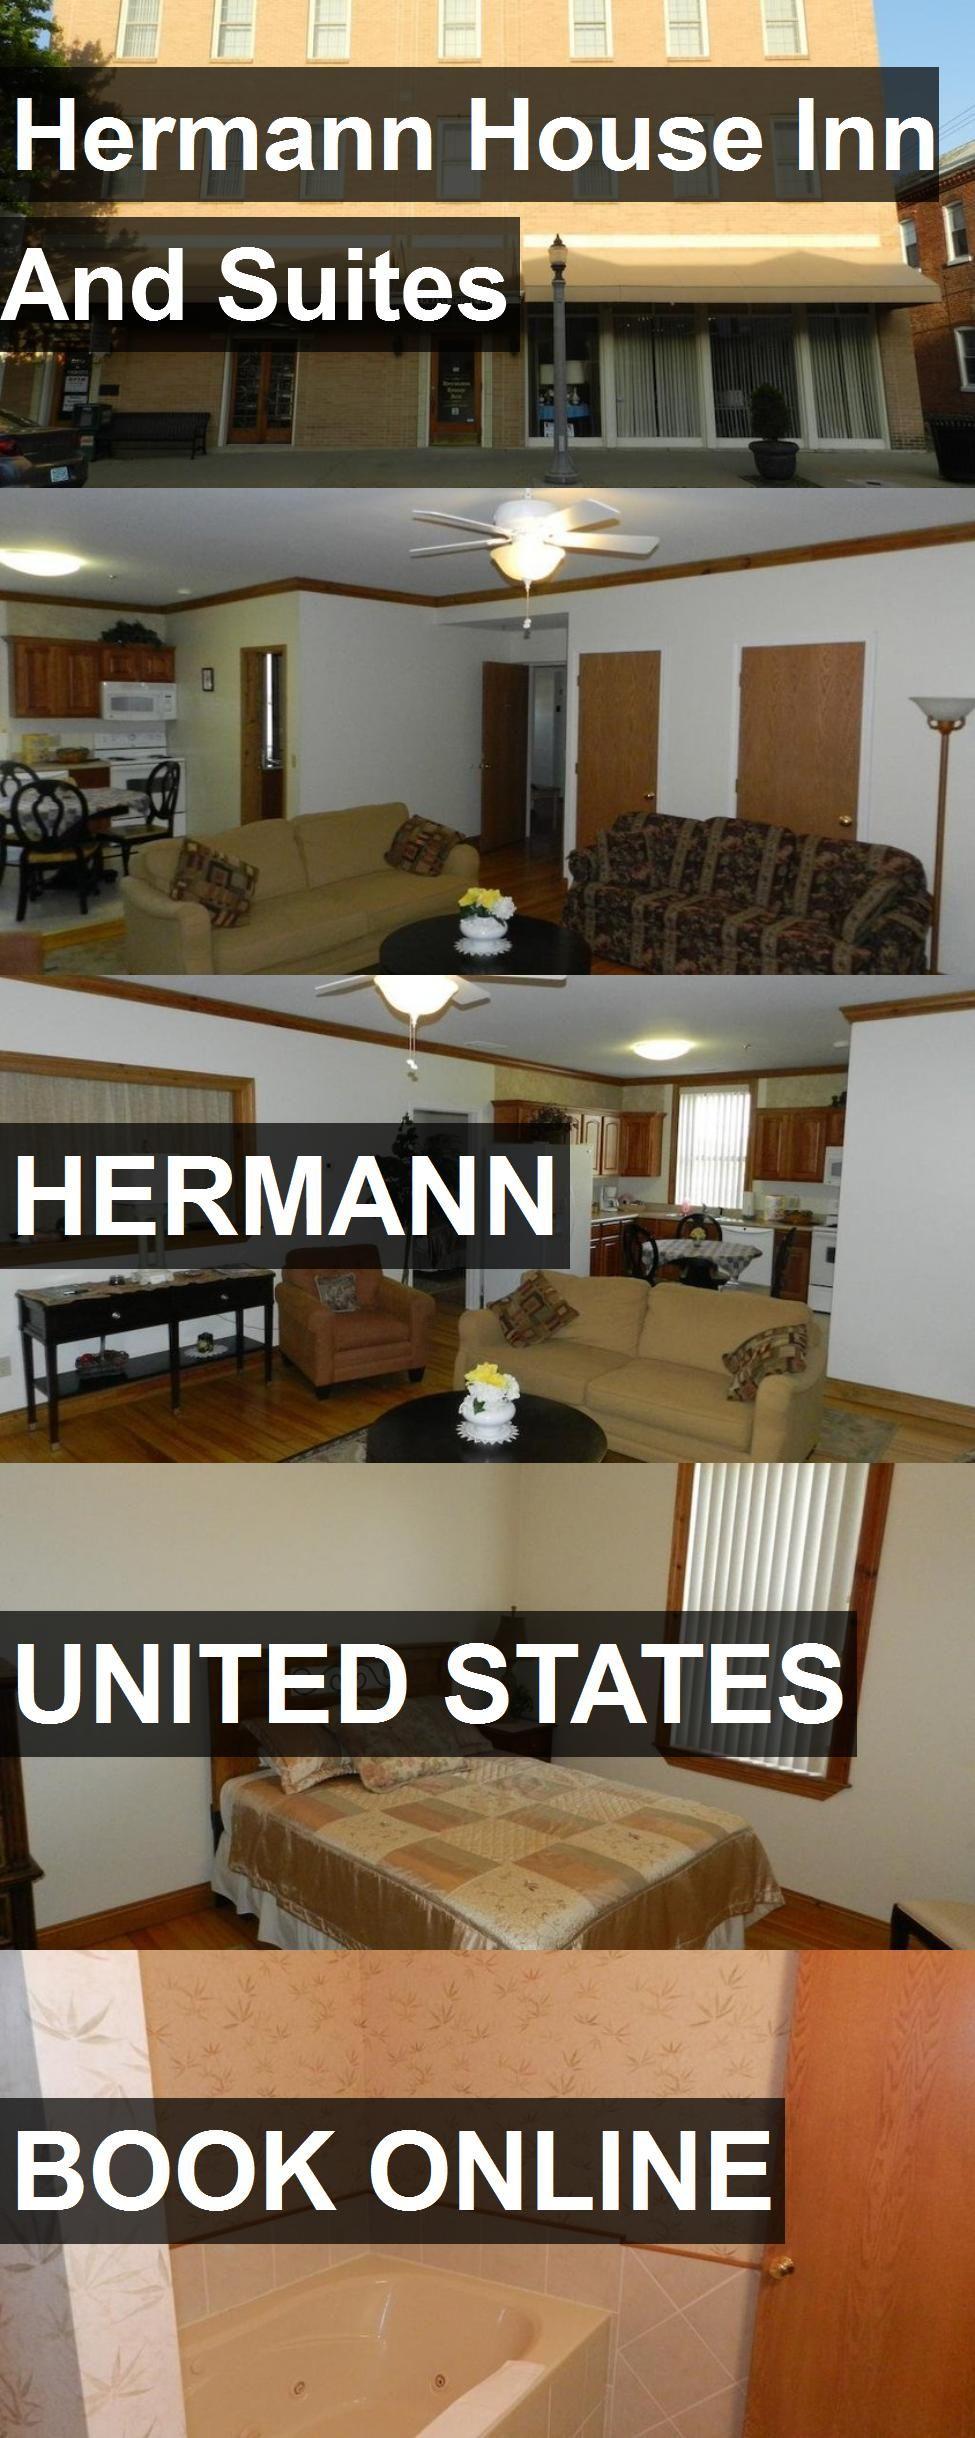 Hotel Hermann House Inn And Suites in Hermann, United